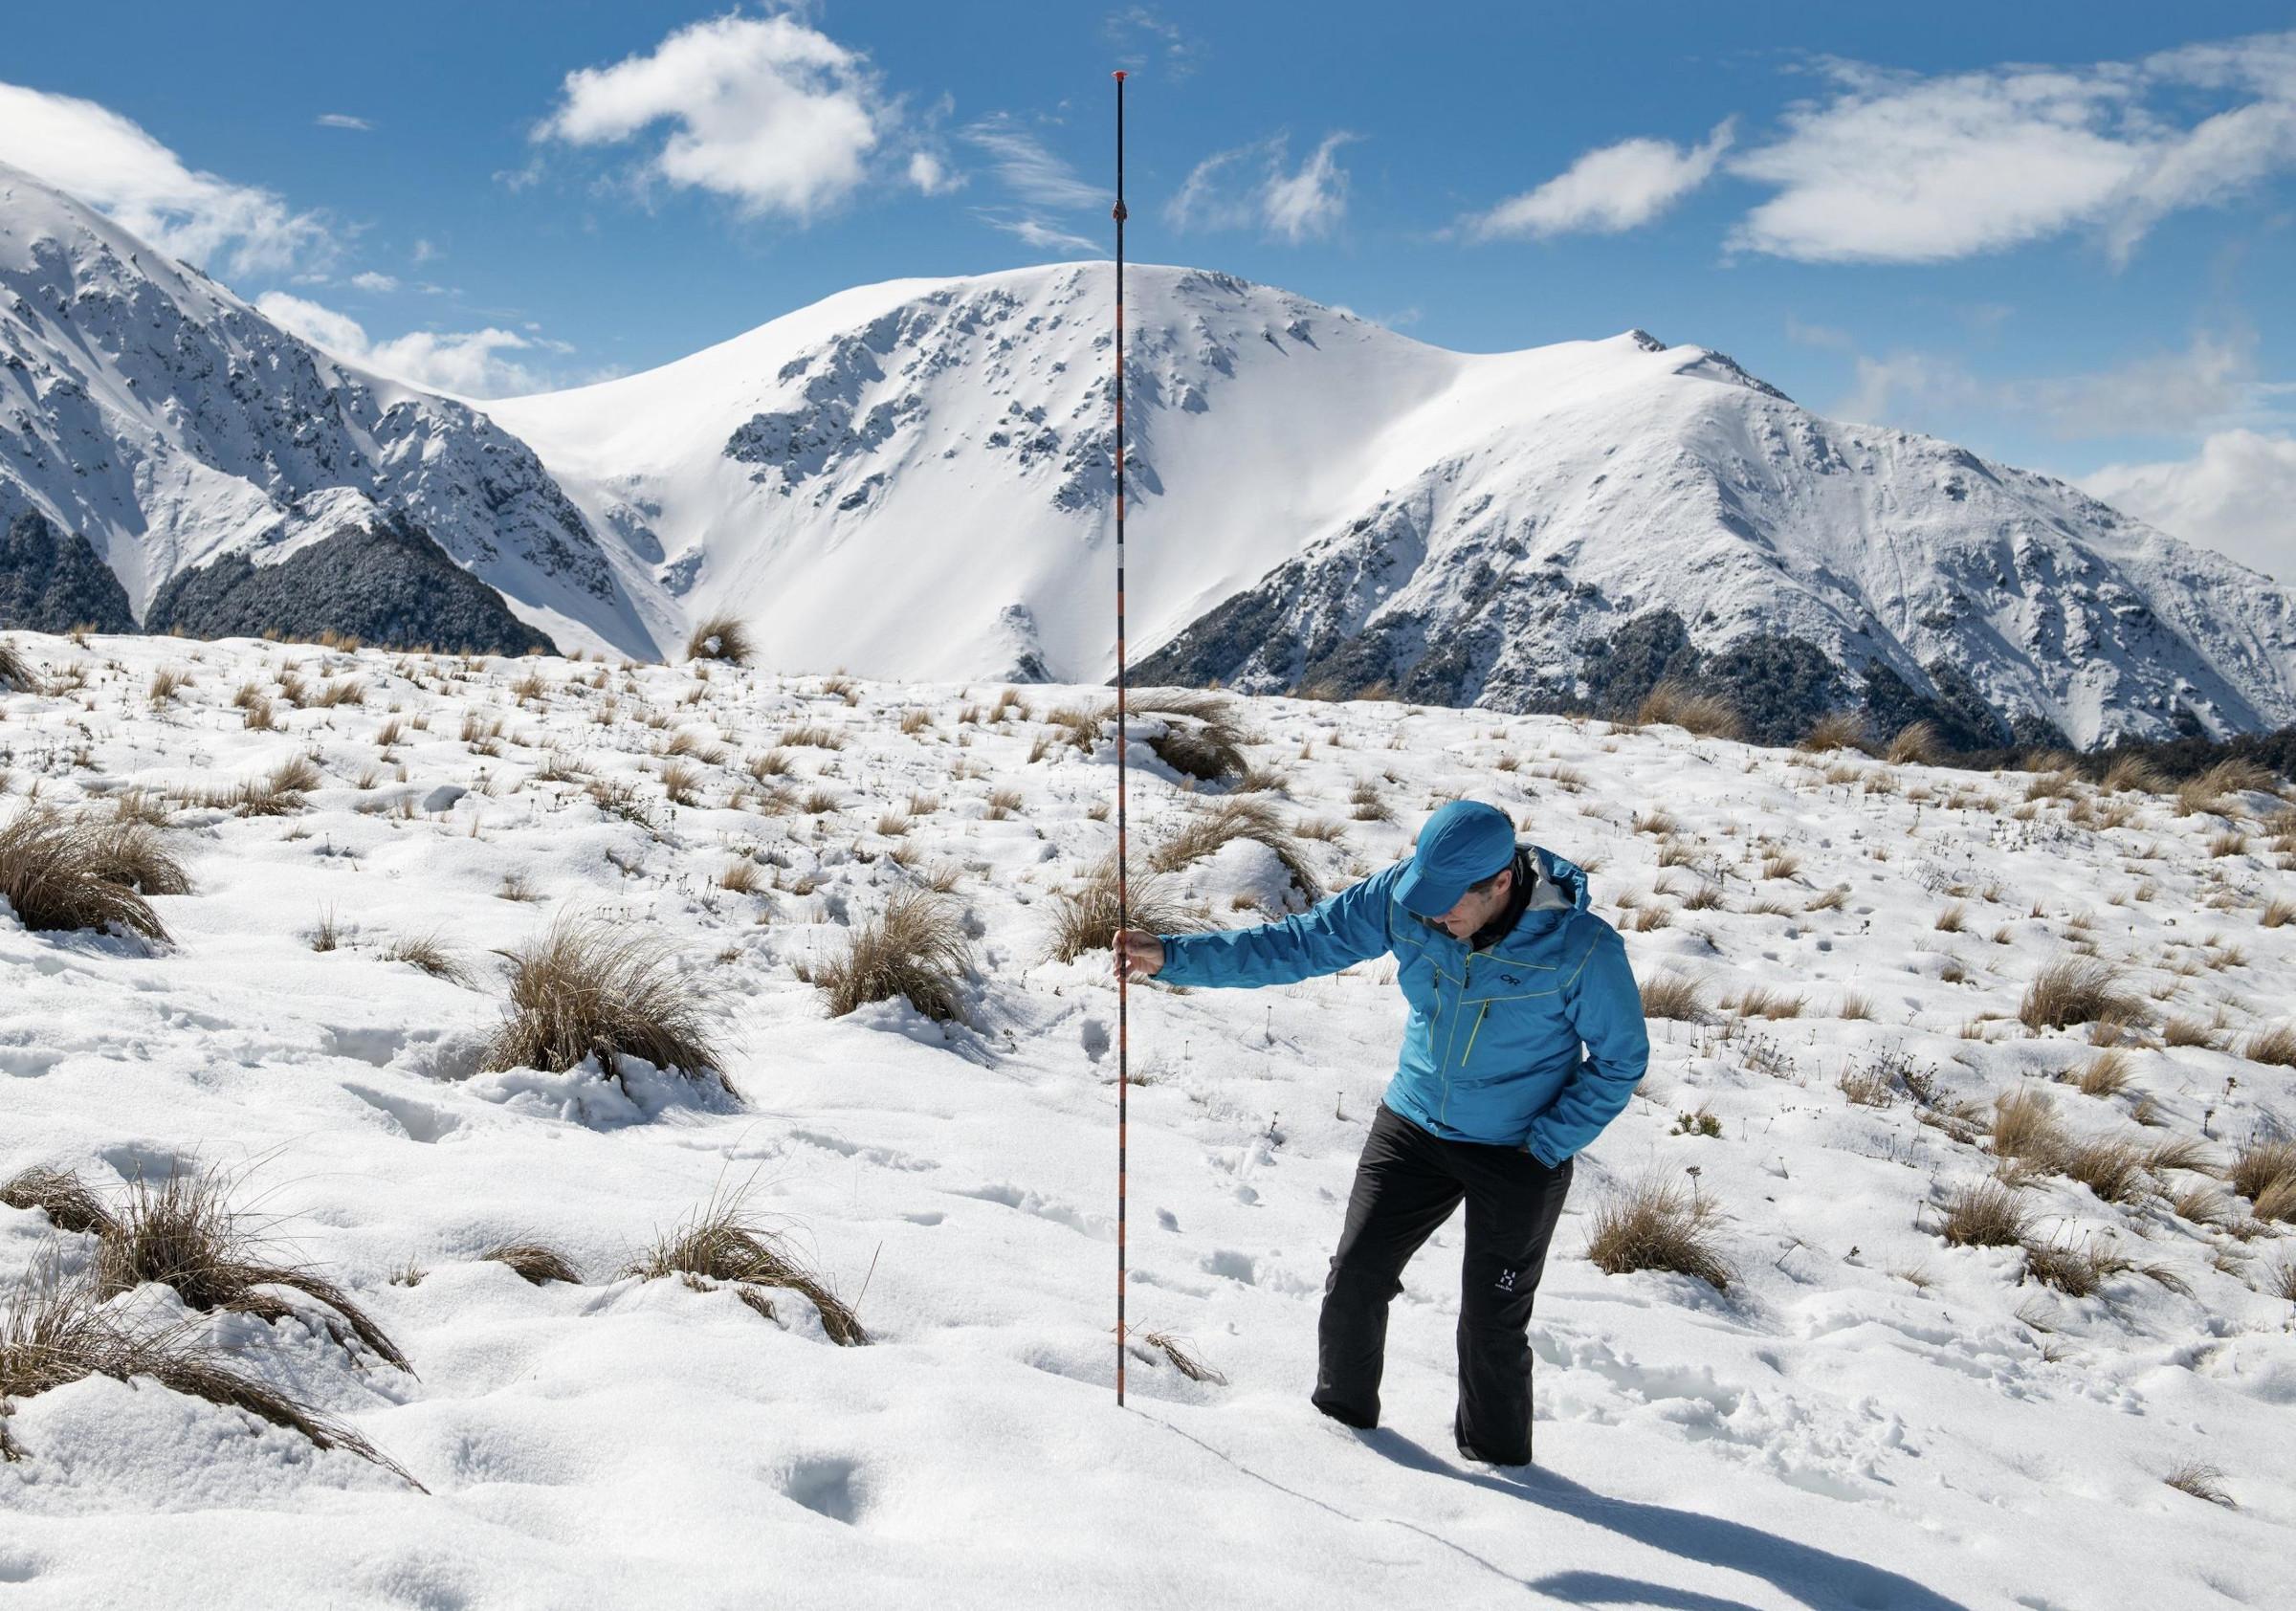 Community Snow Observation: misura la neve e contribuisci a salvare le montagne